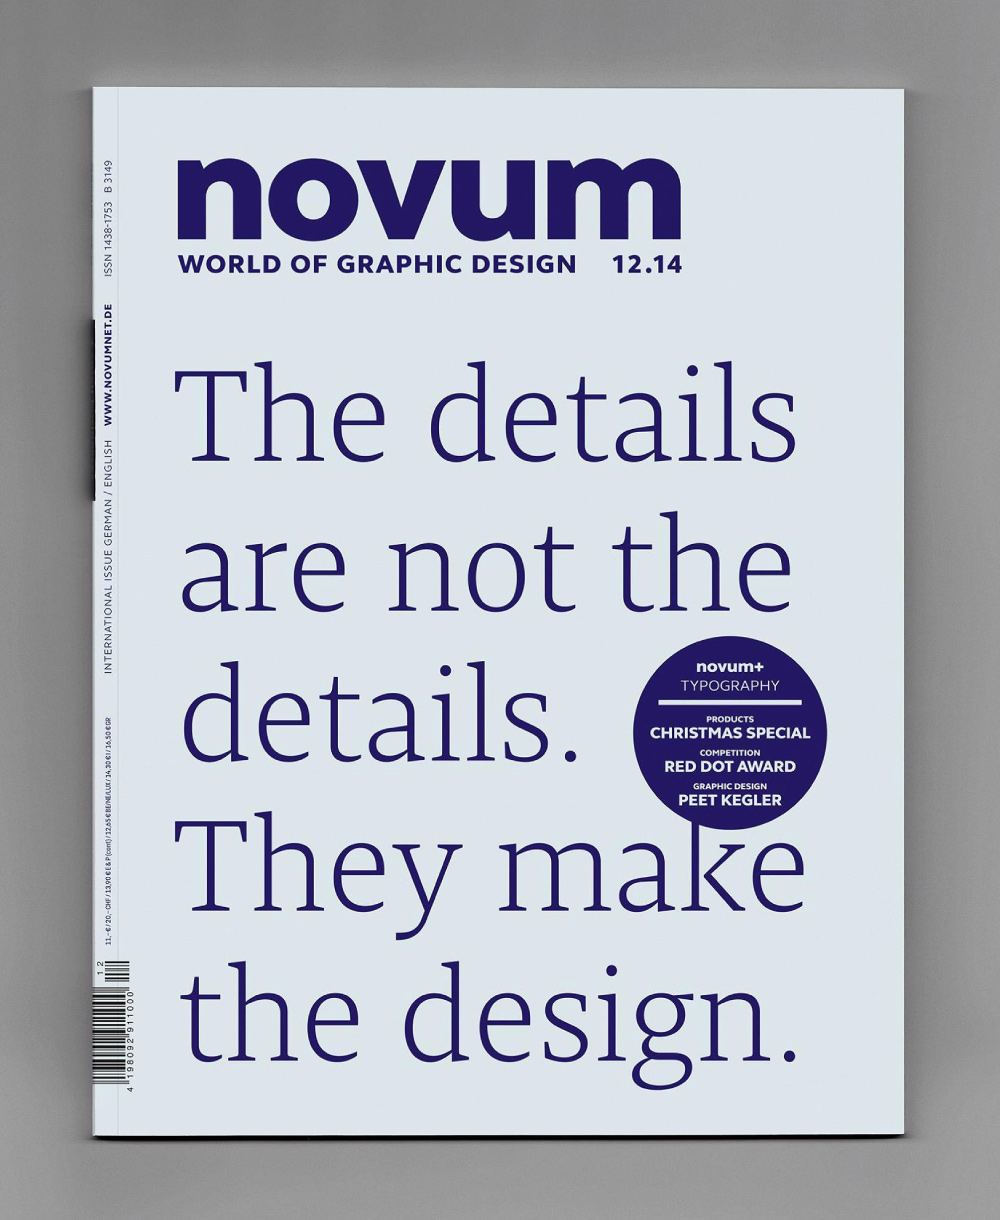 Novum Magazin Dezember 2014, jakob runge, Cover, Titelblat, design, Zitat, Gestaltung, Prägung, Typografie